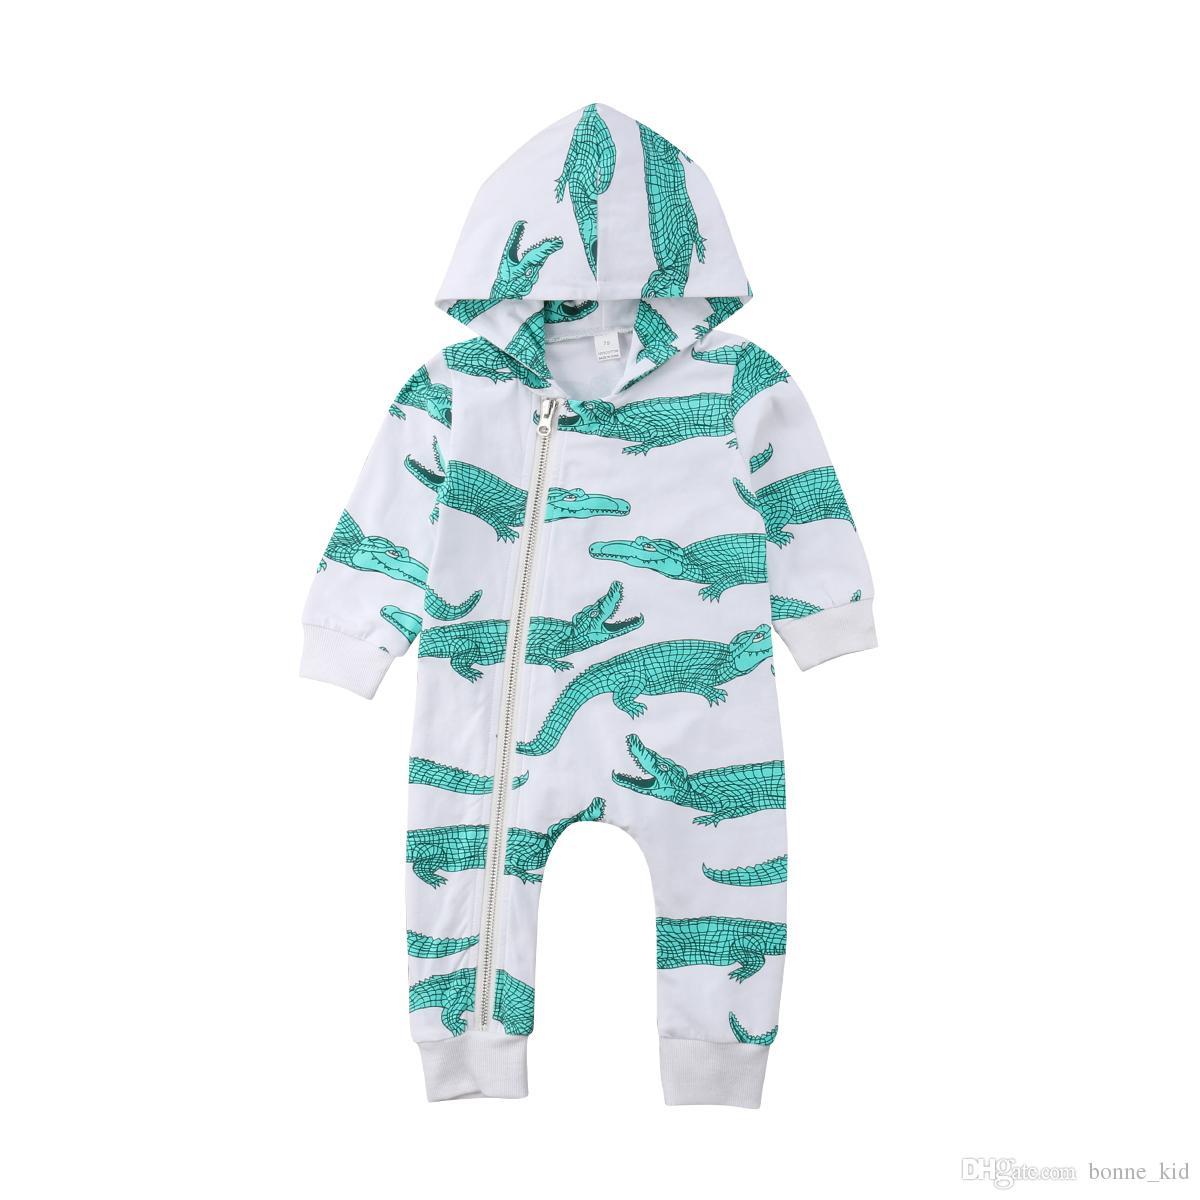 Newborn baby boy animal hooded jumpsuit crocodile pajamas long sleeves autumn spring romper playsuit infant baby kid clothing rompers 0-24M